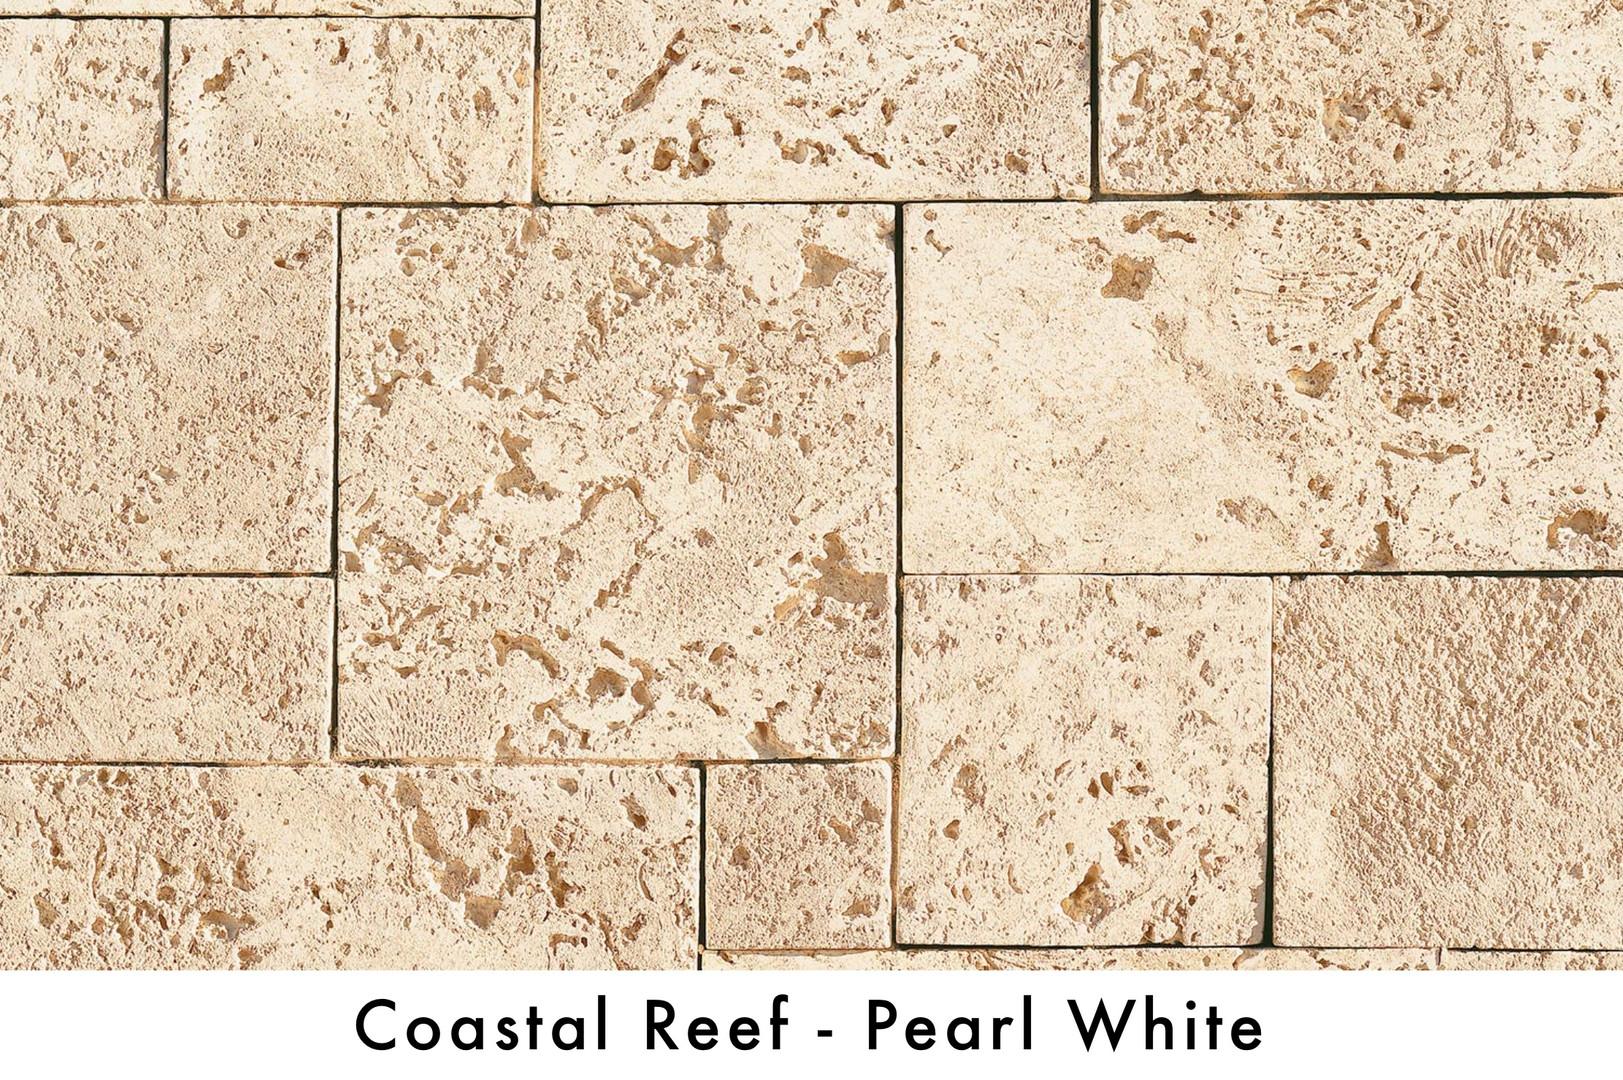 Coastal Reef - PearlWhite